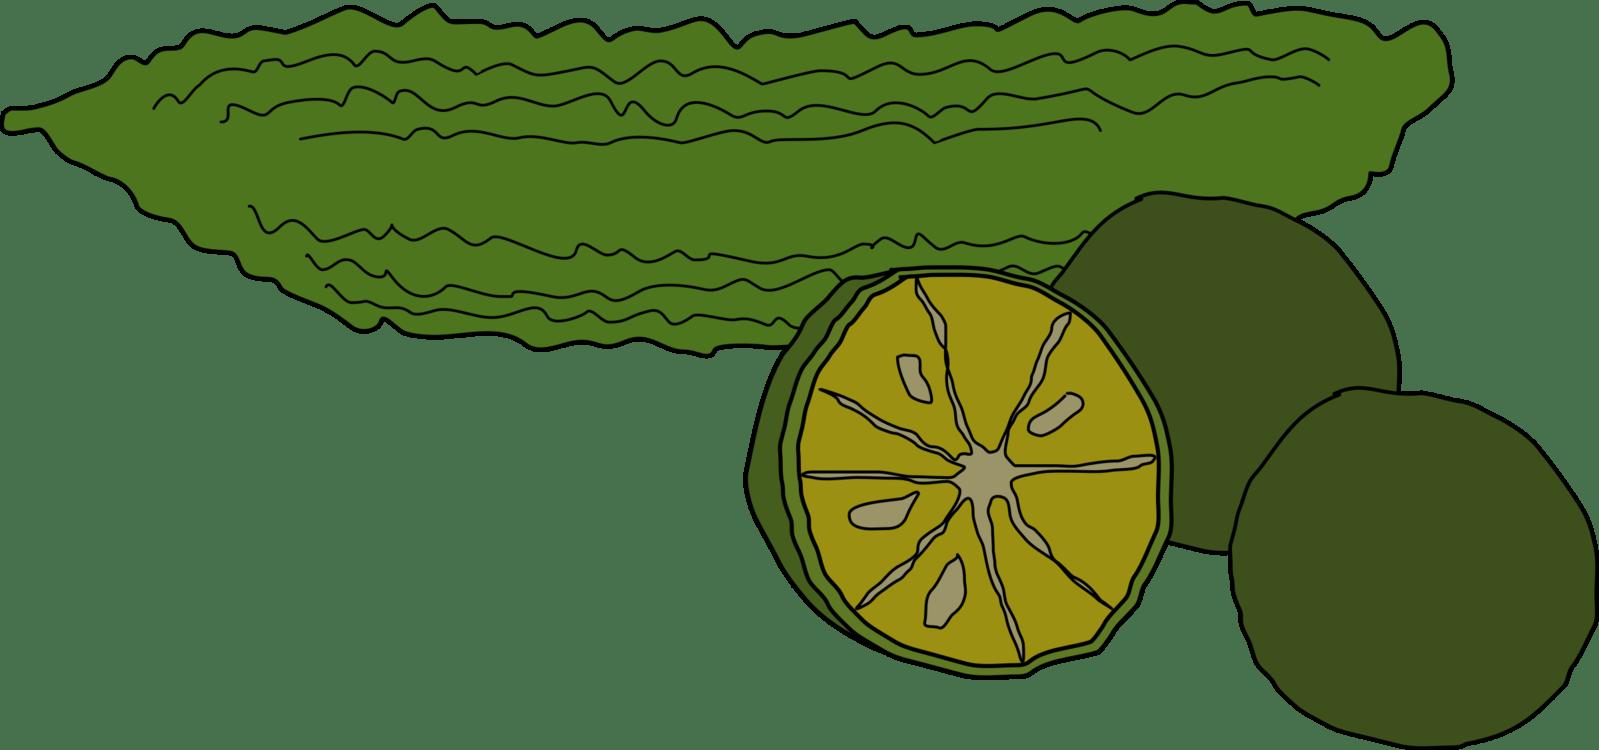 hight resolution of bitter melon coffee food vegetable pumpkin